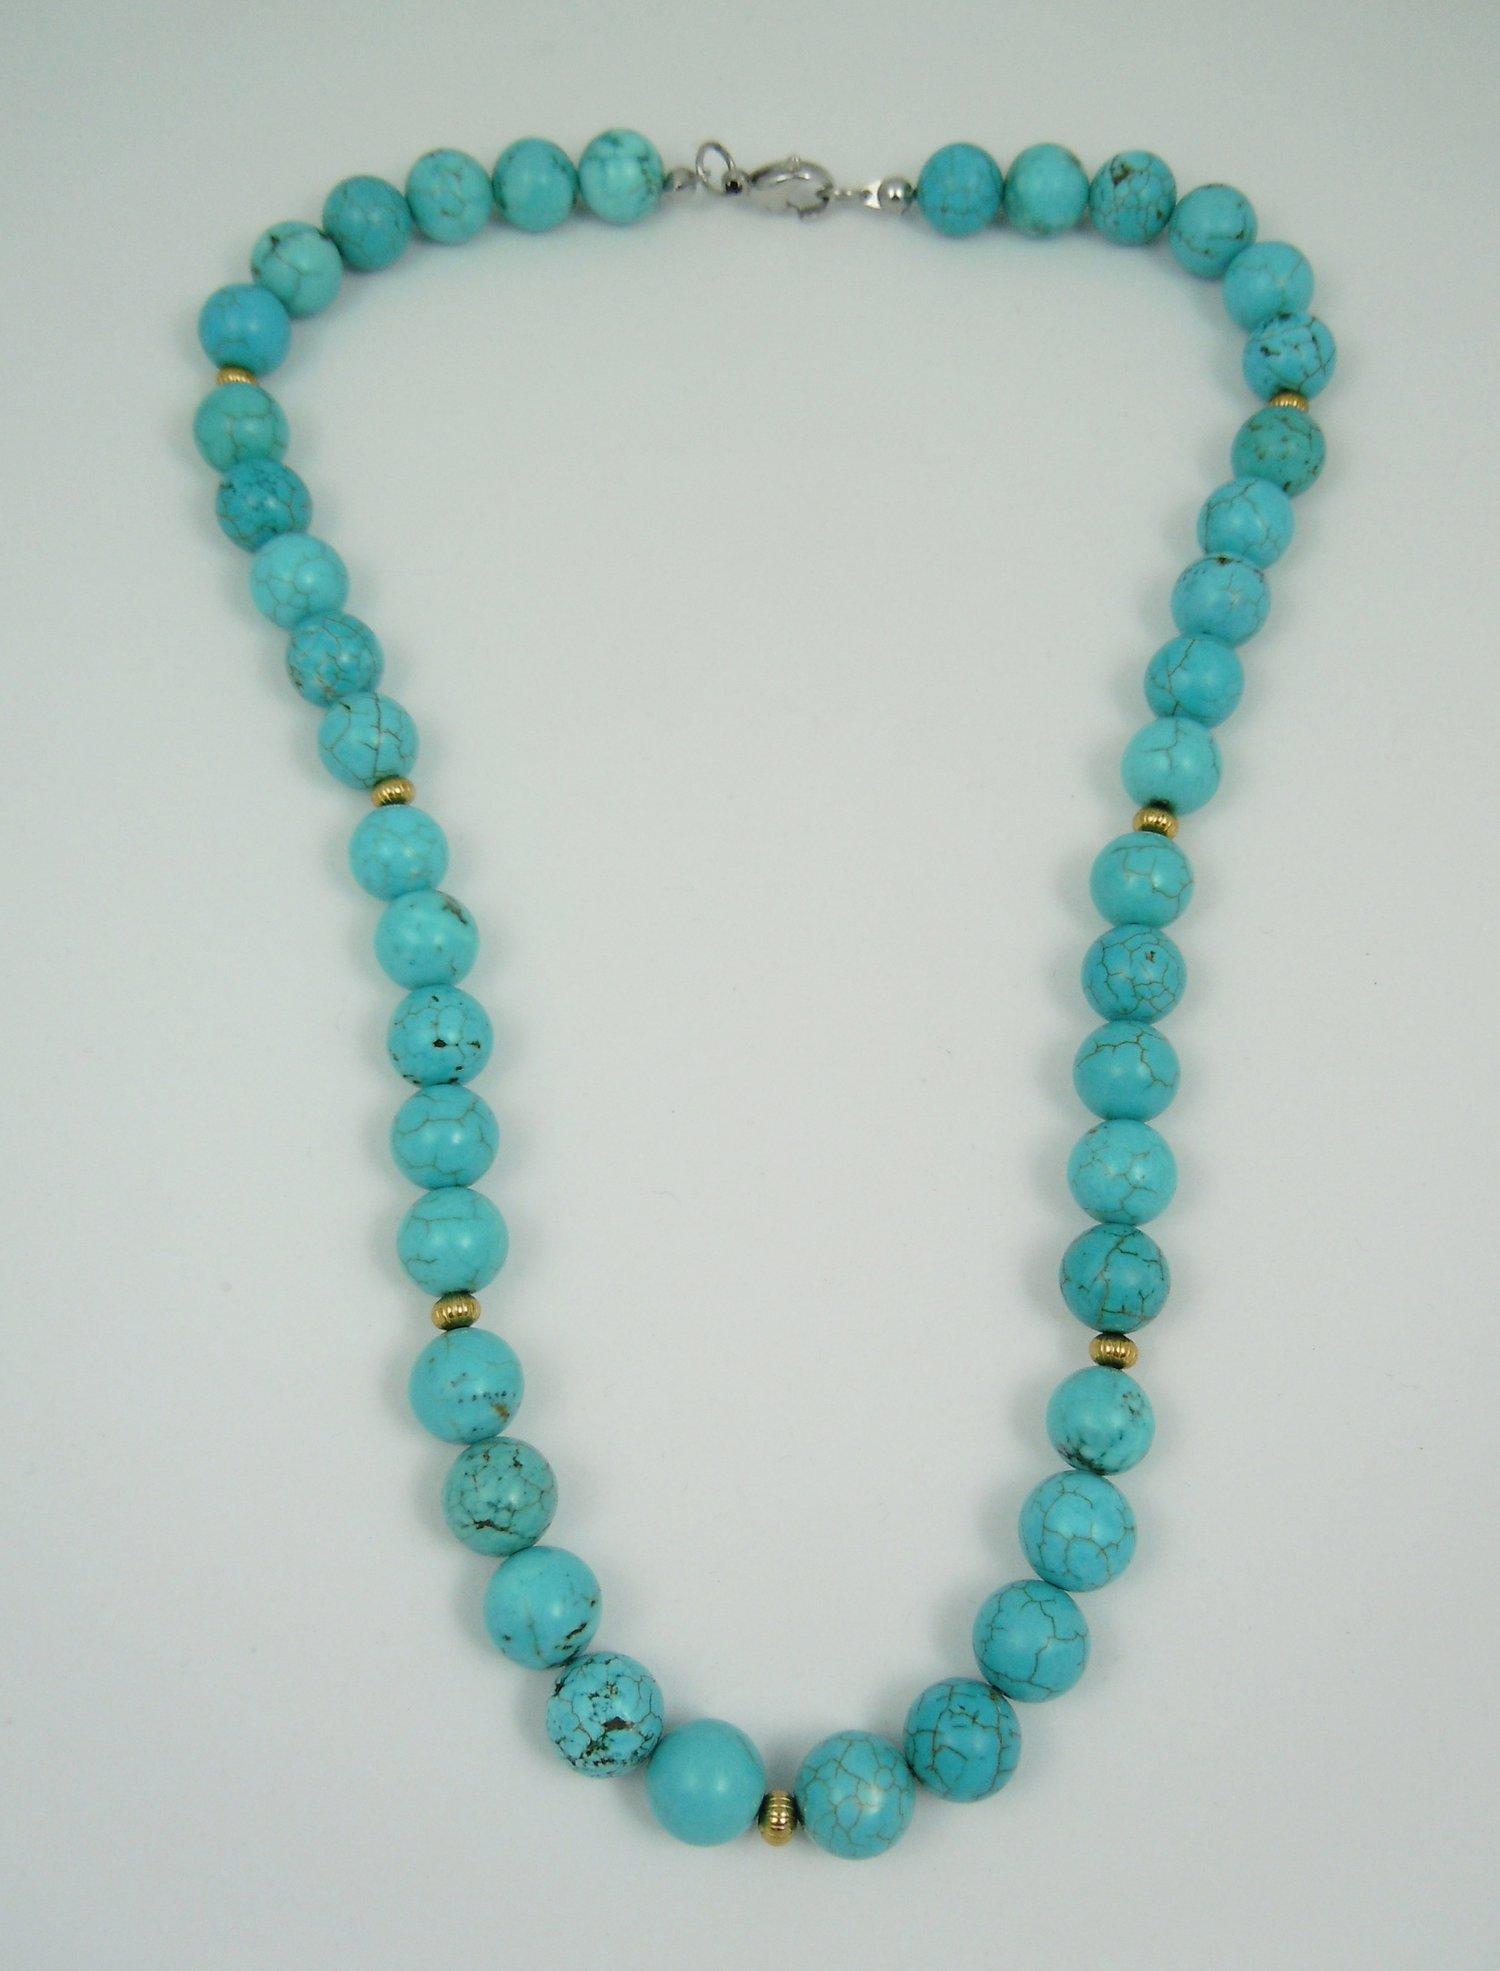 Turquoise Magnesite Minimalist Necklace